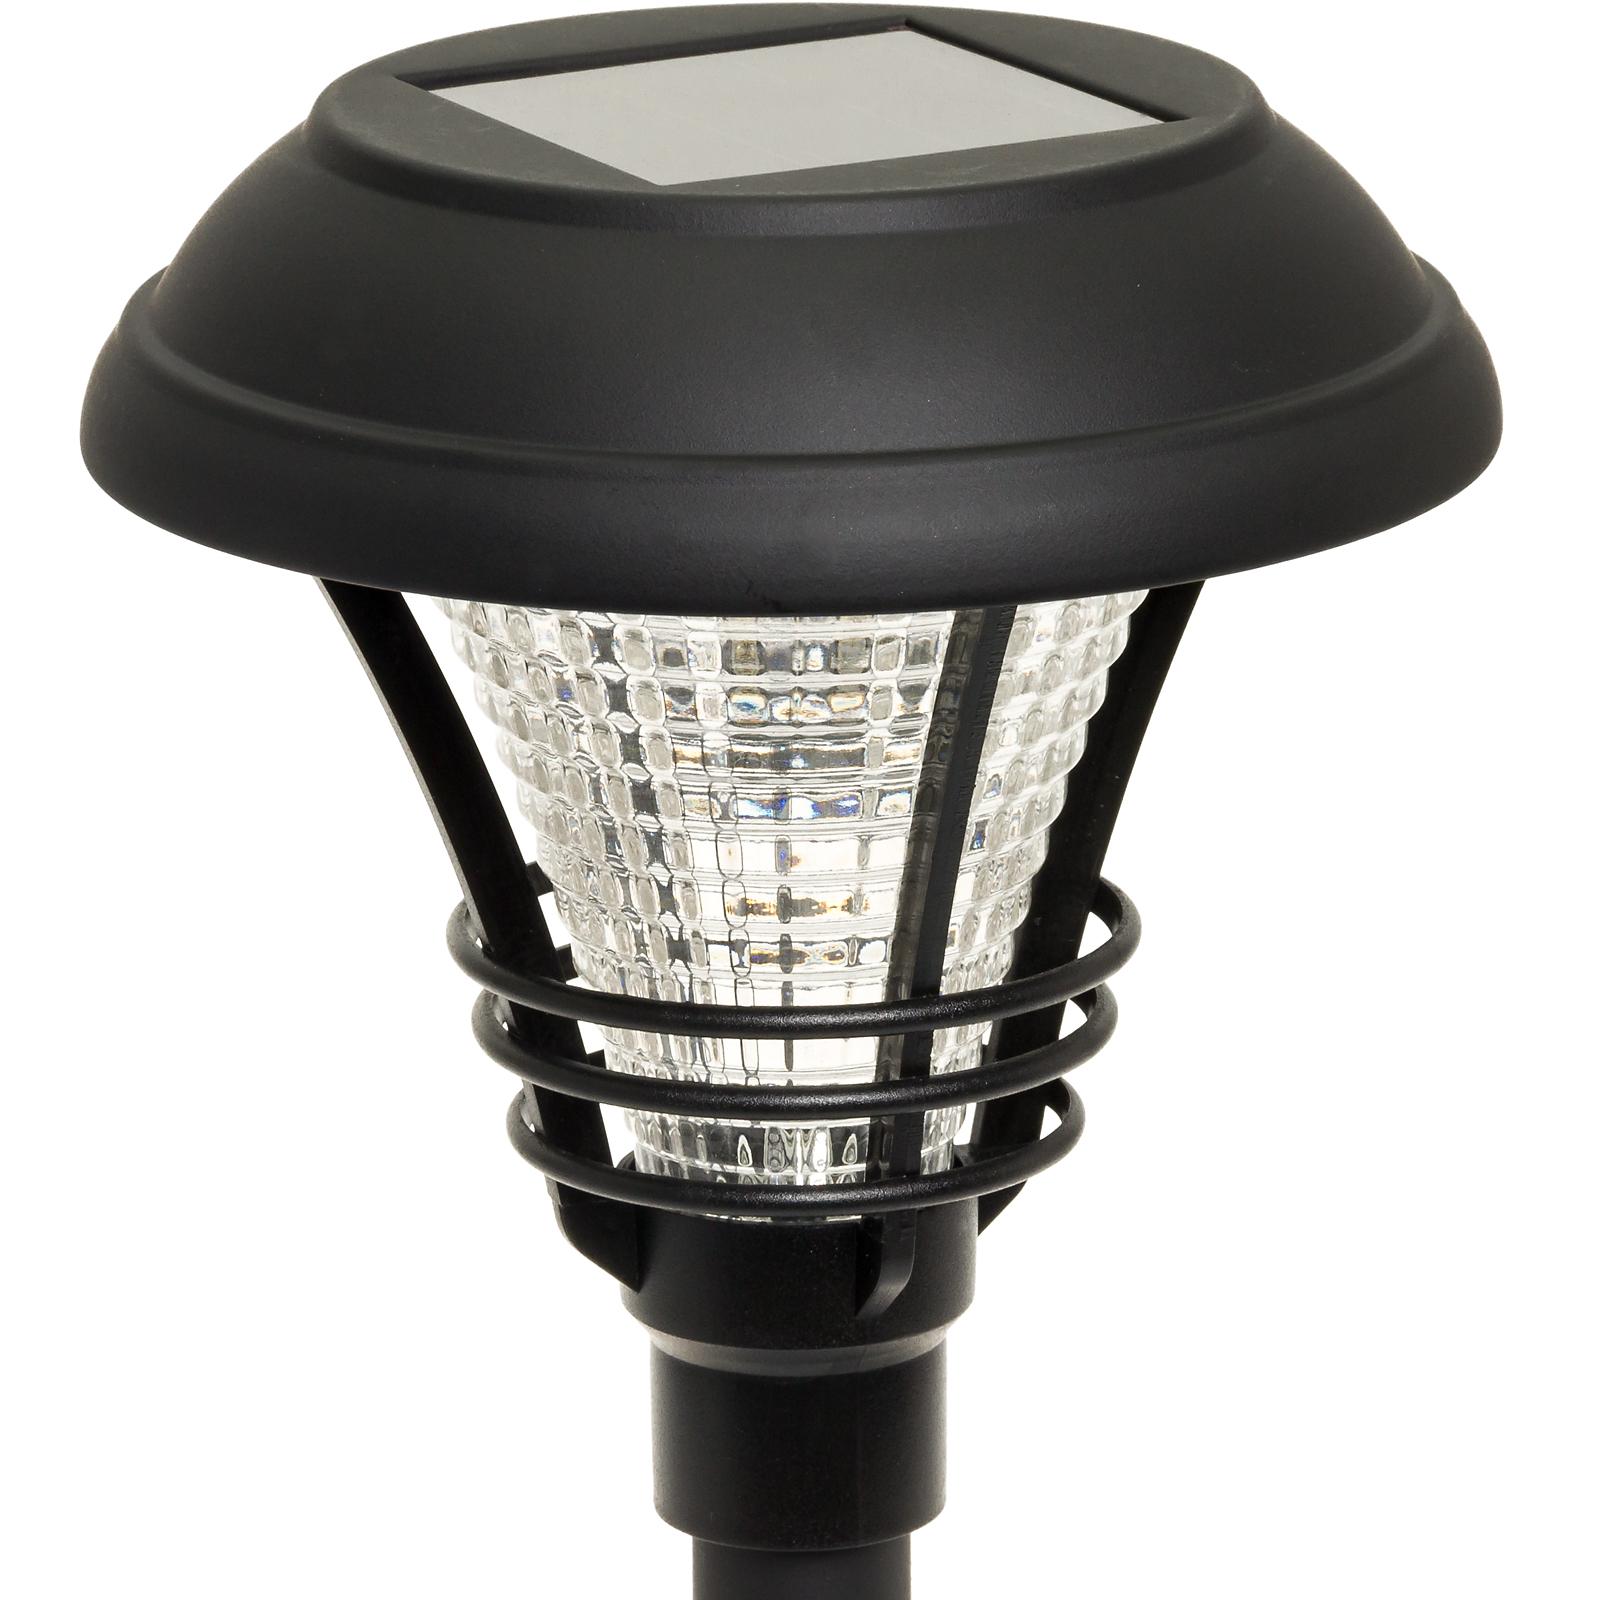 Solar Walkway Lights Target: WESTINGHOUSE NEW Kenbury Solar Garden 10 Lumens LED Stake